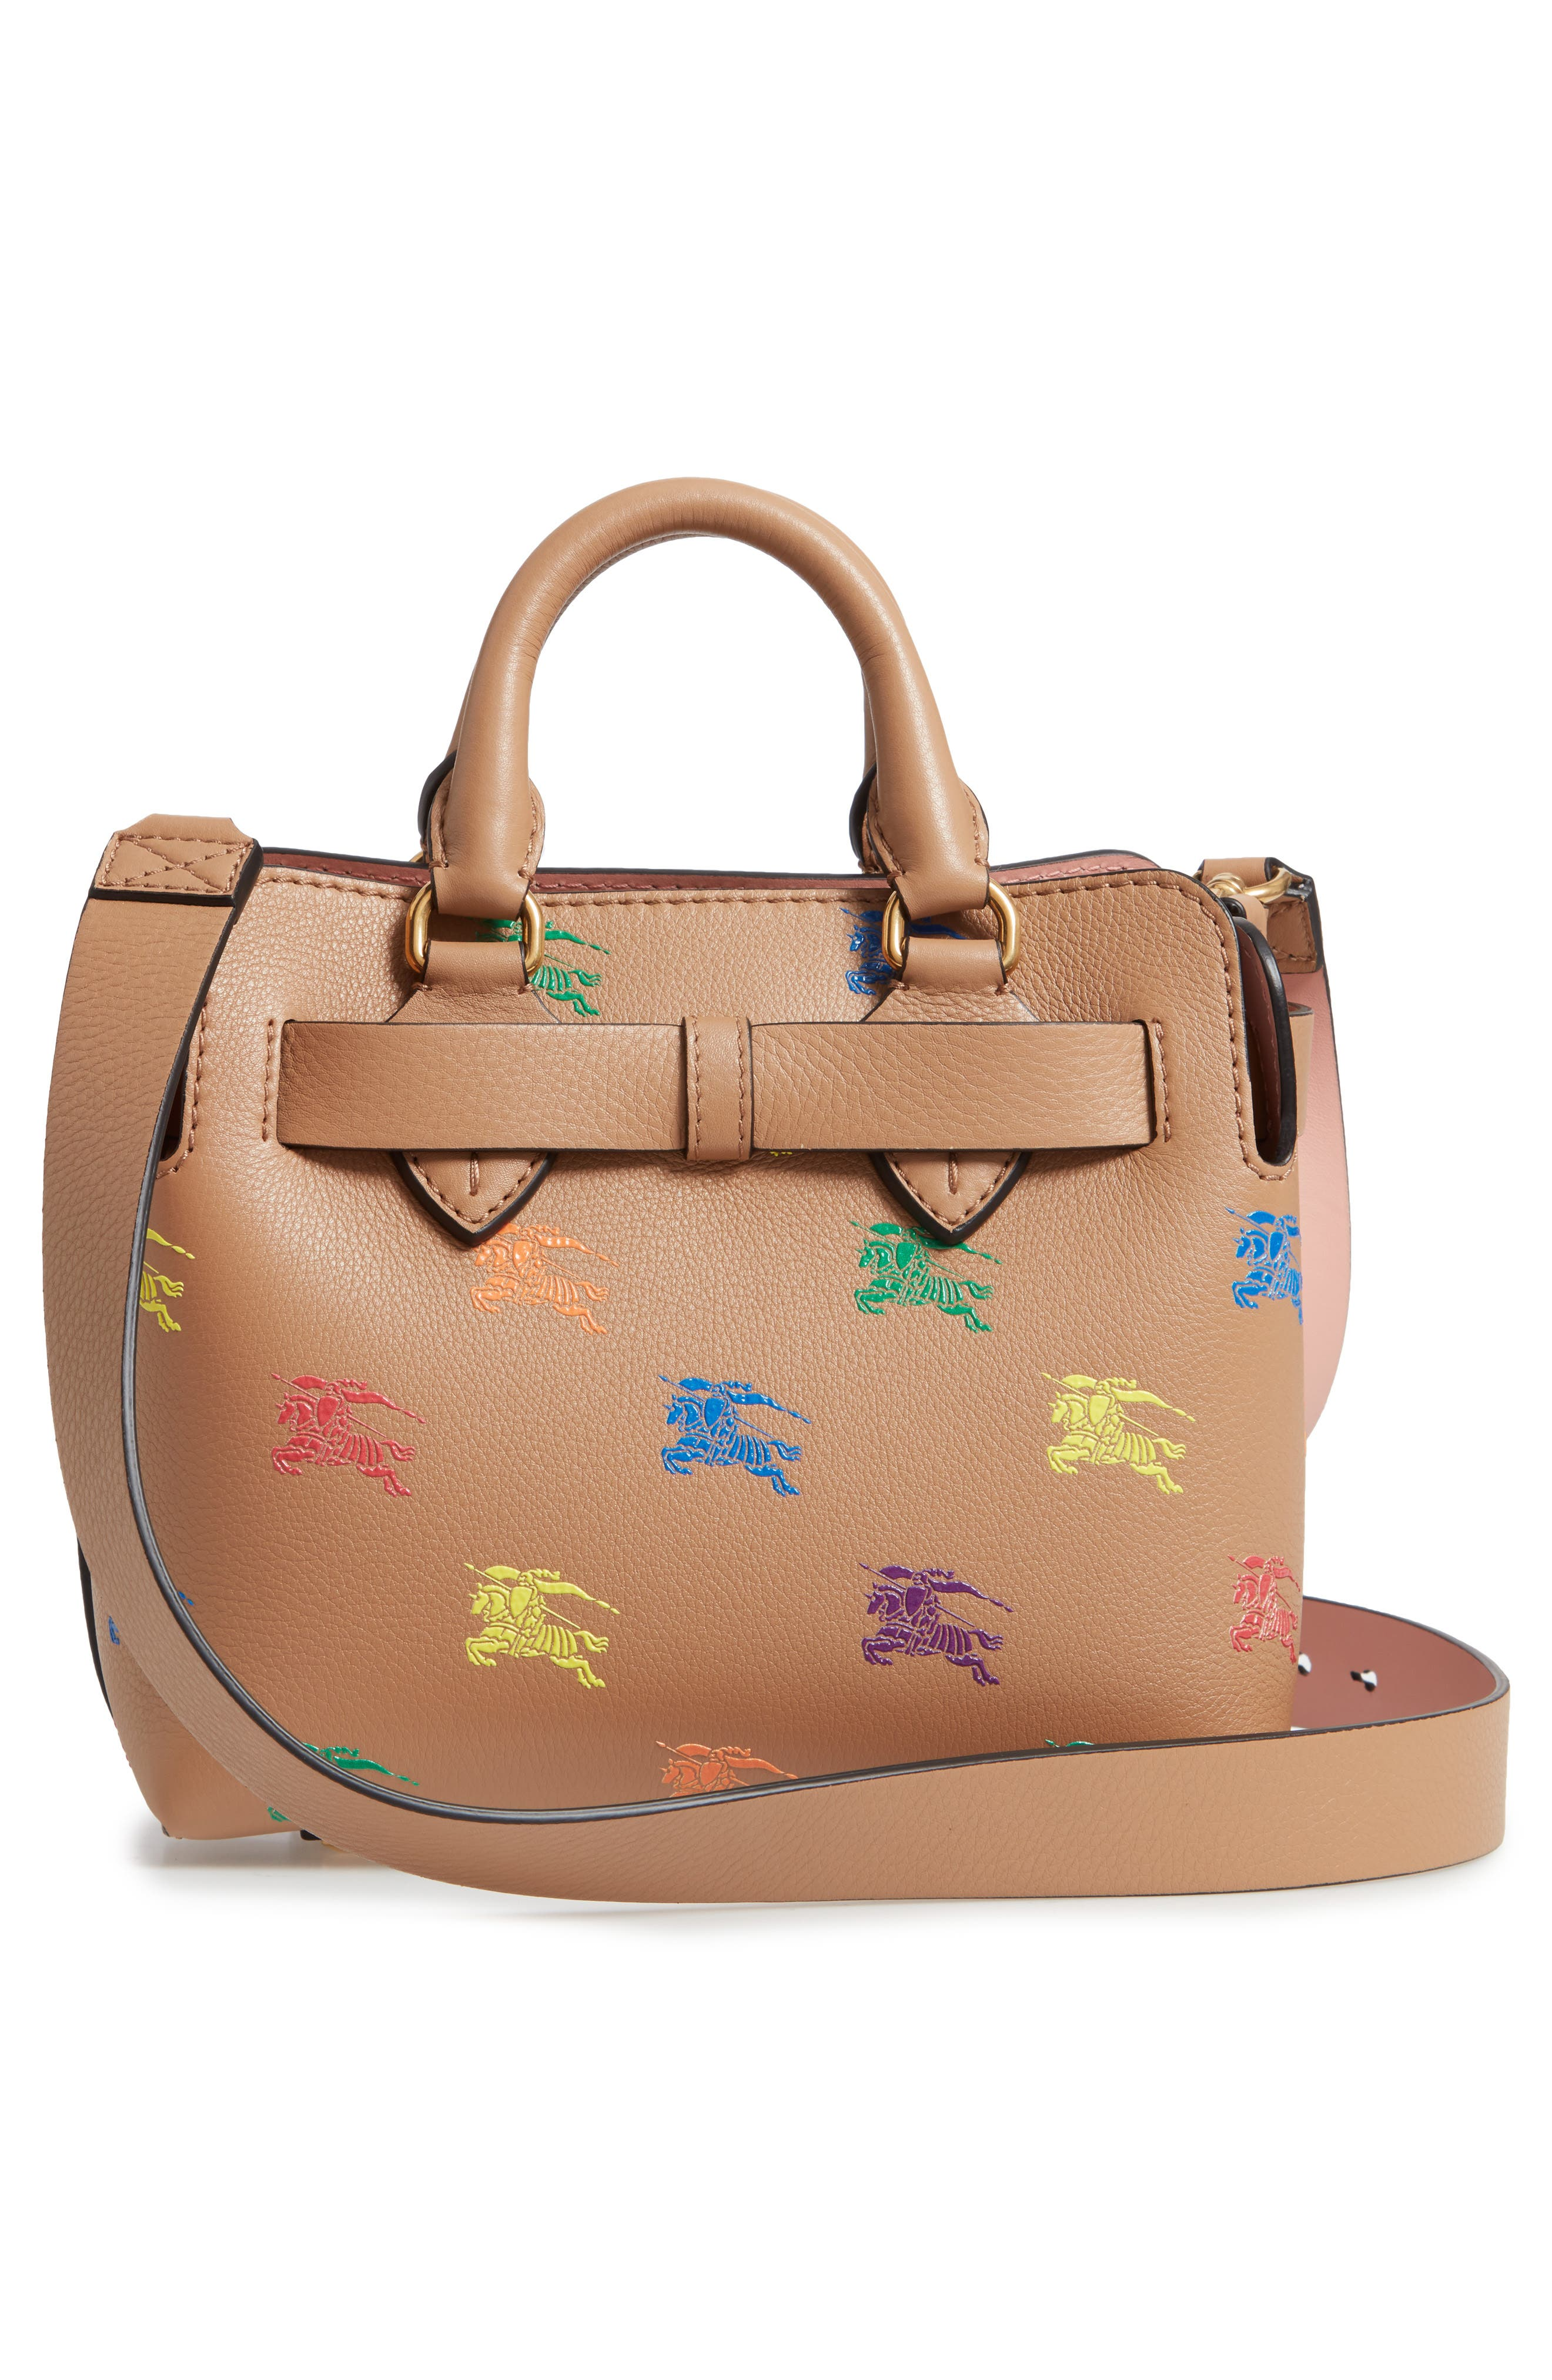 Baby Belt Bag Rainbow Logo Leather Tote,                             Alternate thumbnail 3, color,                             LIGHT CAMEL